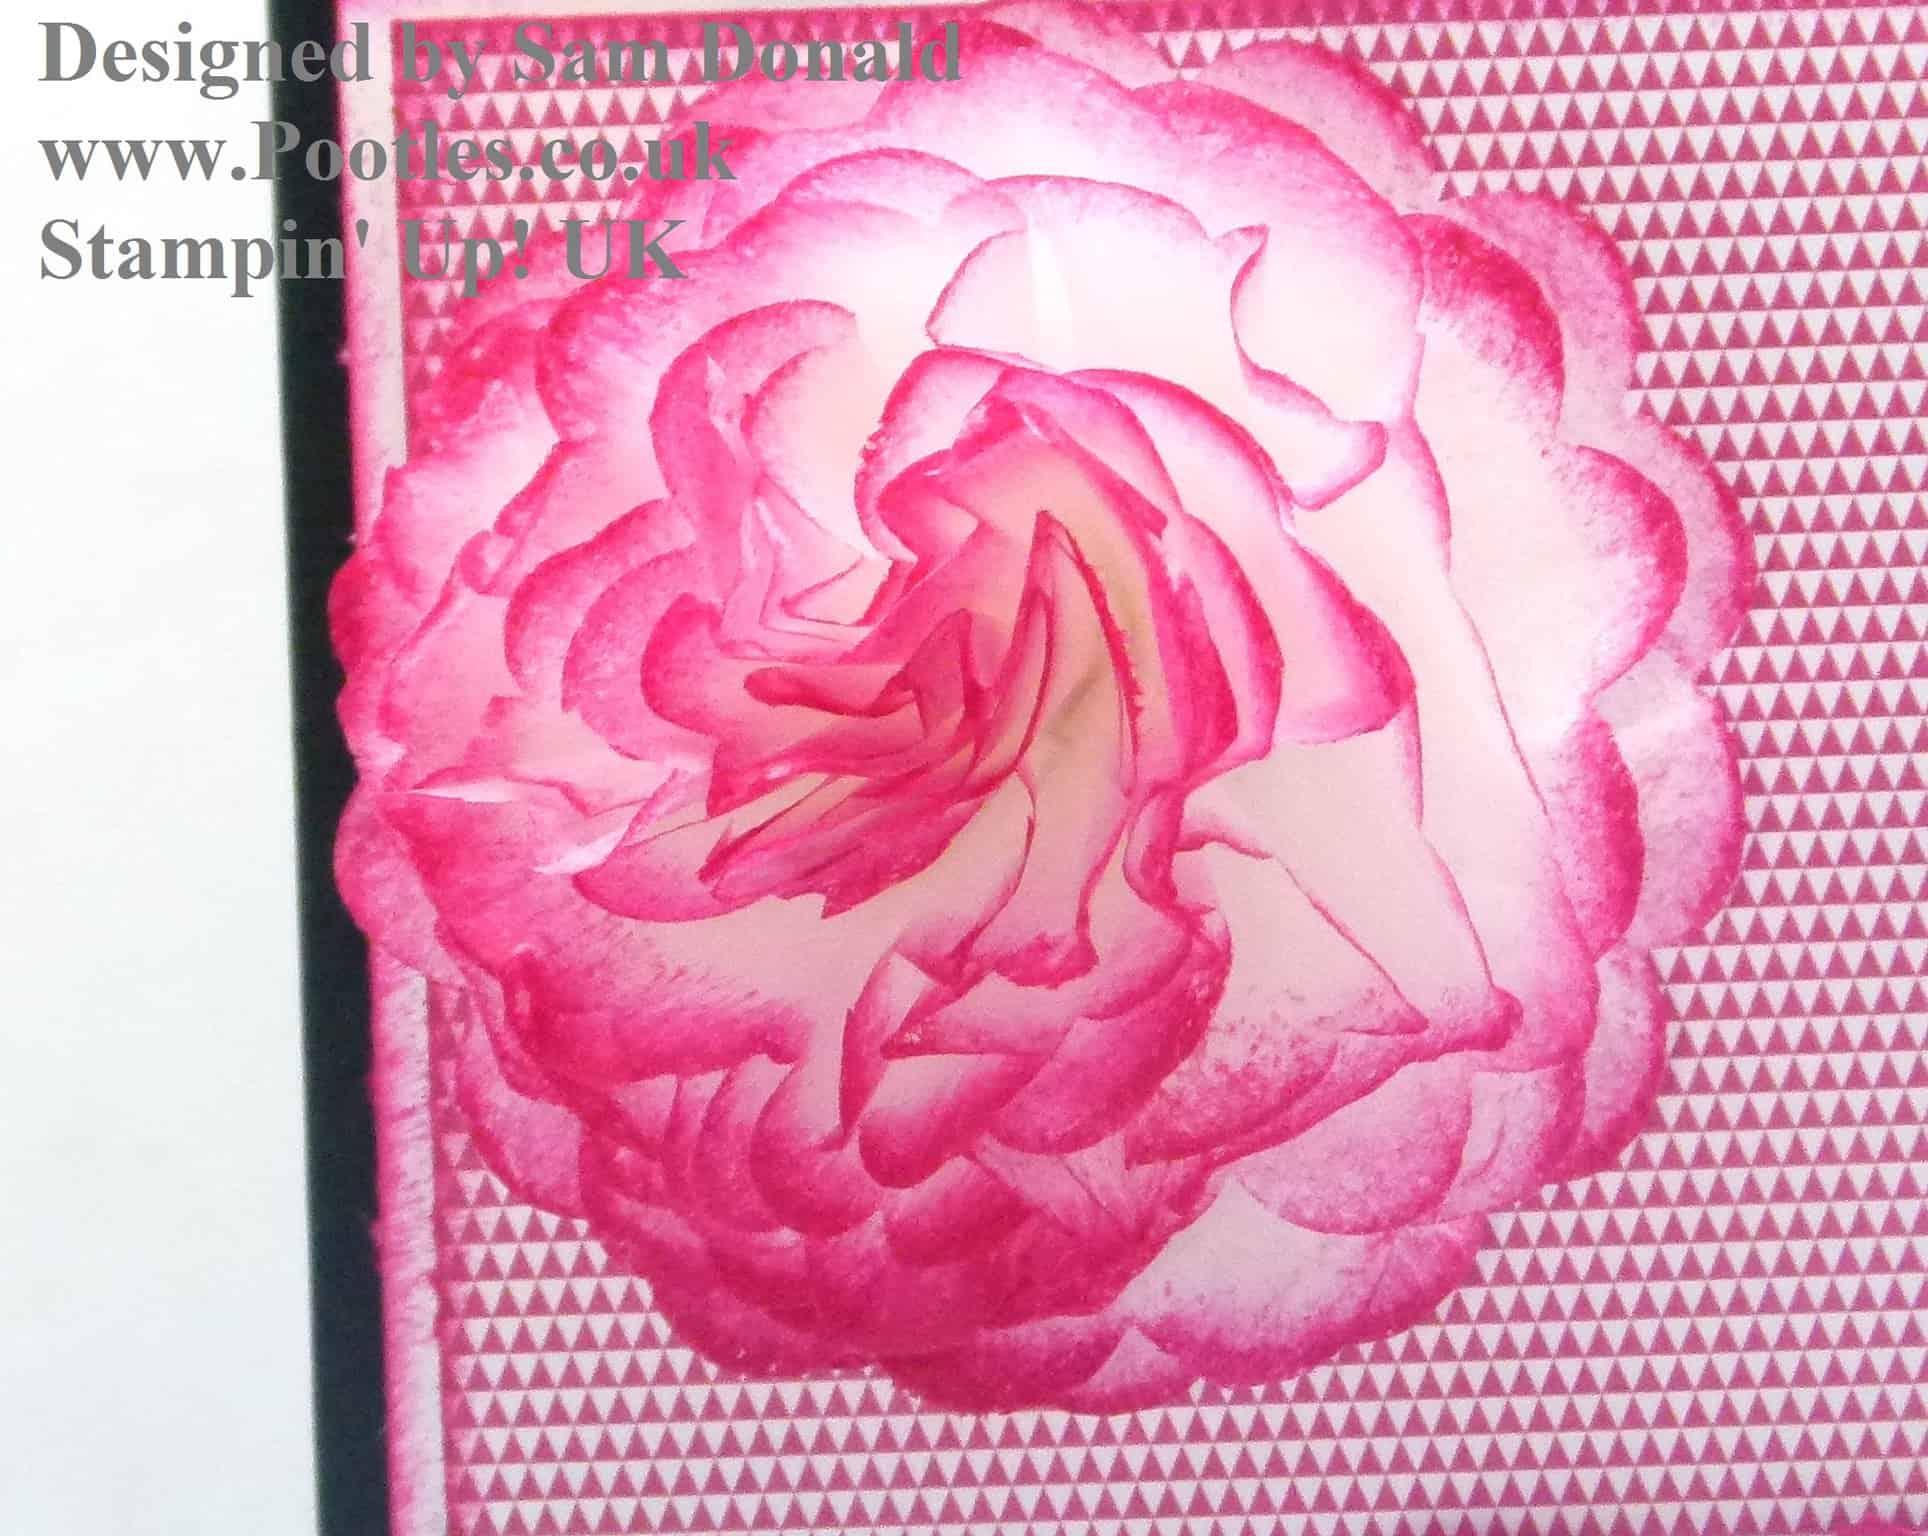 Pootles Stampin Up UK Crepe Filter Flower Tutorial 2